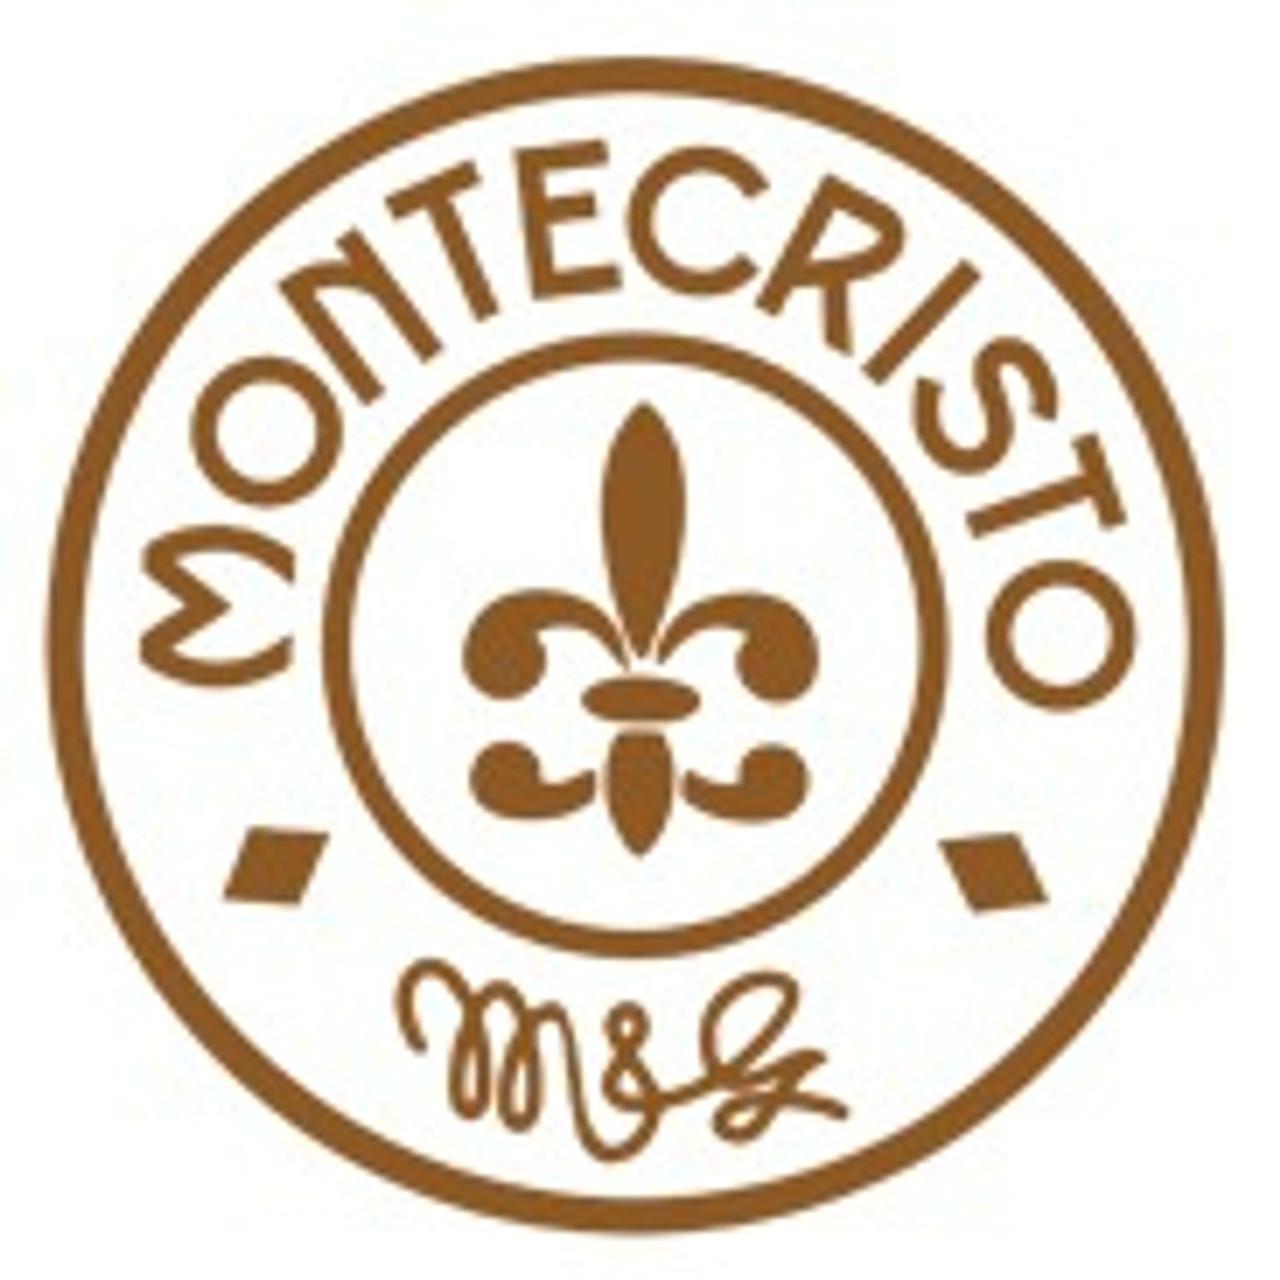 Montecristo No. 1 Cigars - 6.62 x 44 (Box of 25)